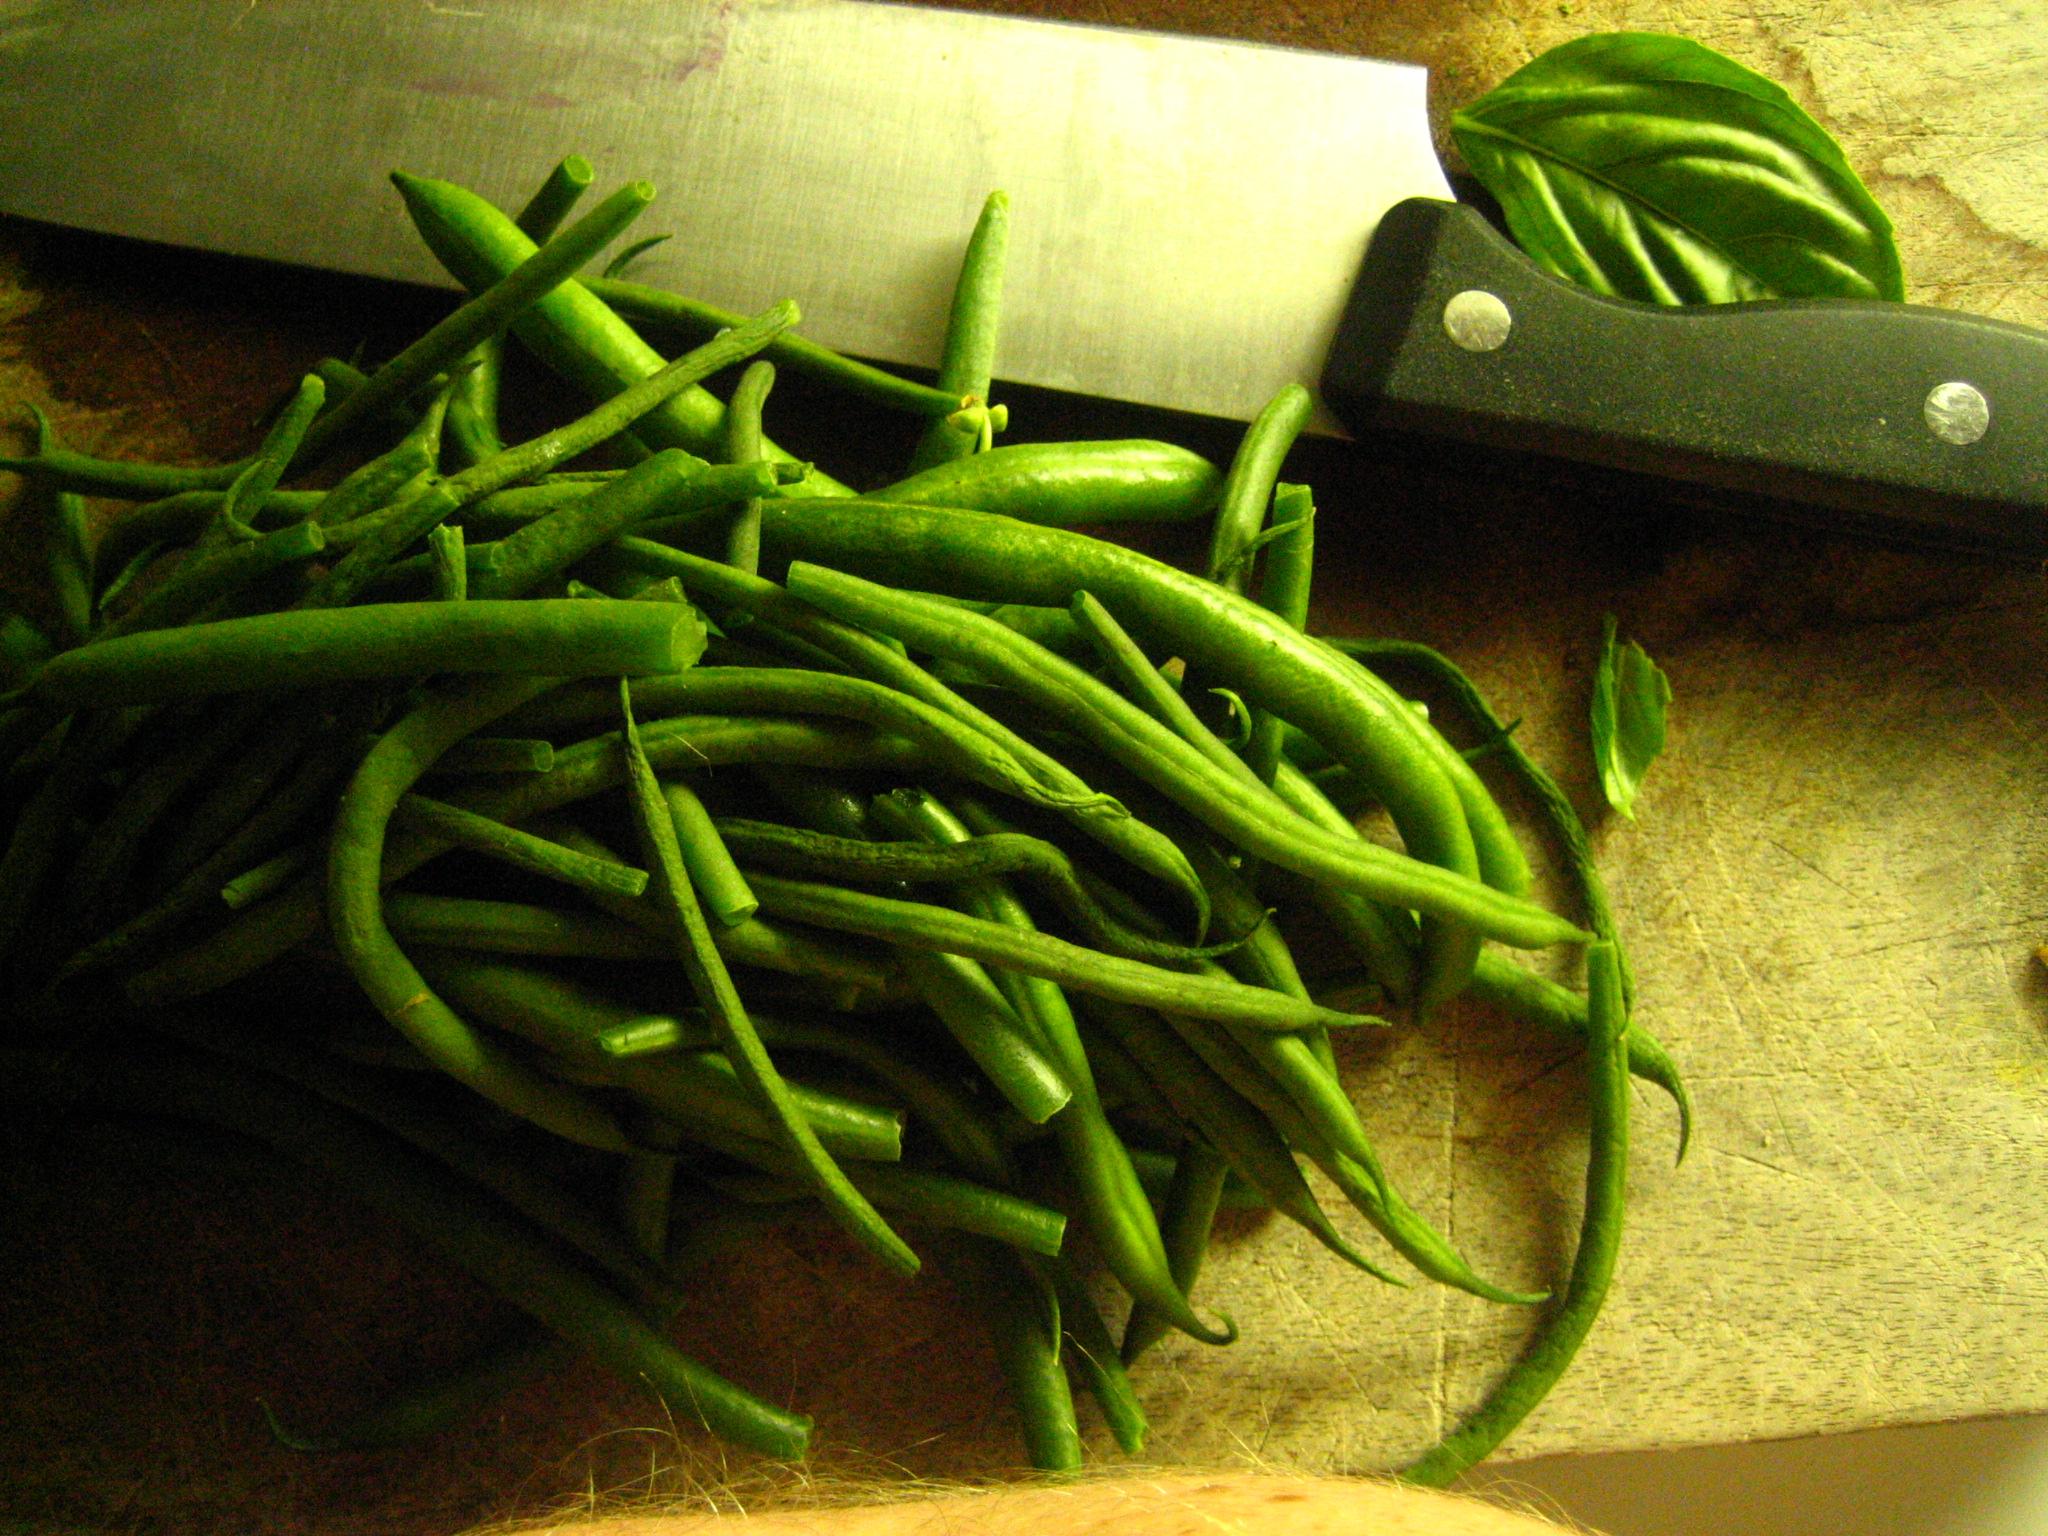 Haricot Verts = Thin Green Beans